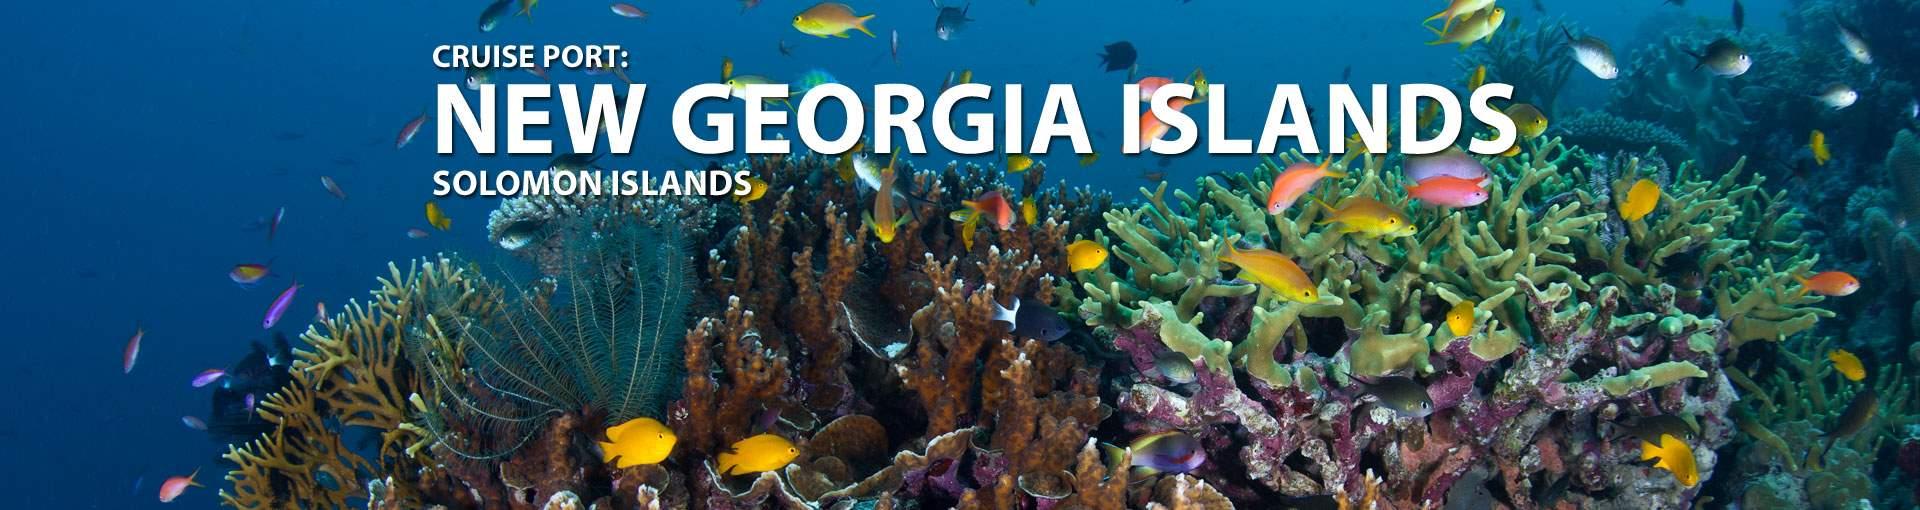 Cruises to New Georgia Islands, Solomon Islands